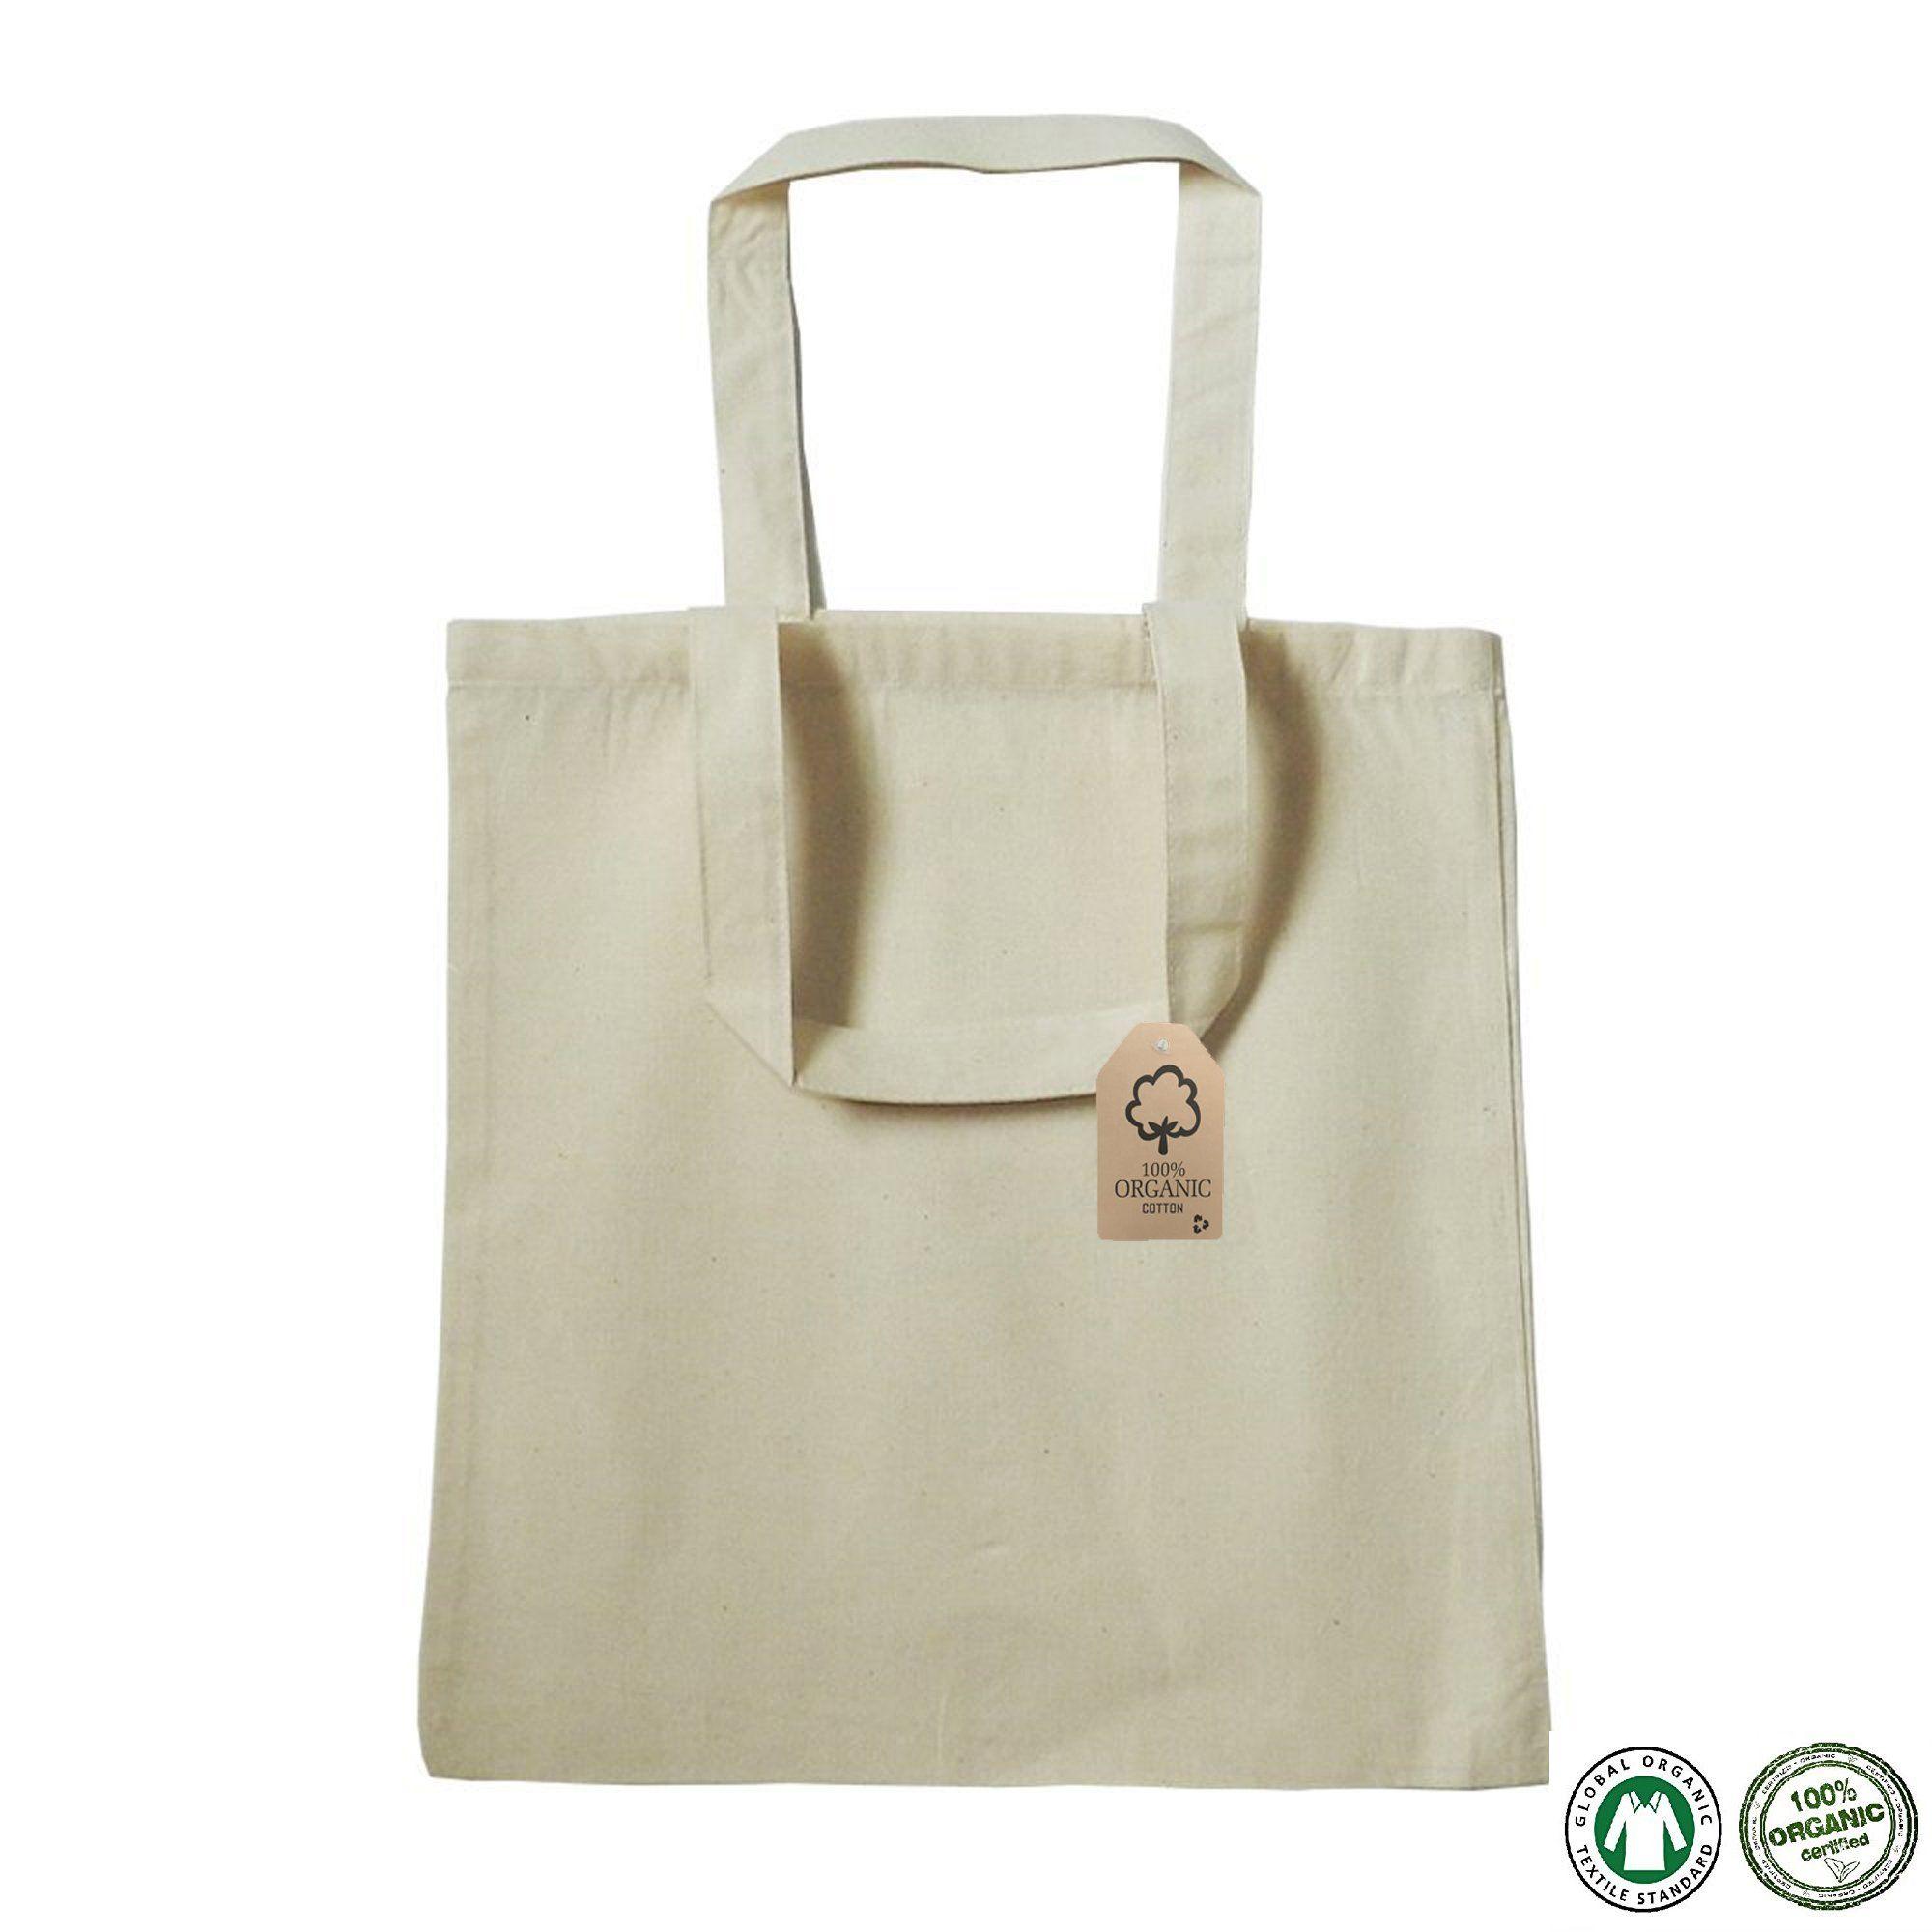 Organic Cotton Canvas Tote Bags Wholesale Plain Tote Bags Organic Cotton Tote Wholesale Tote Bags